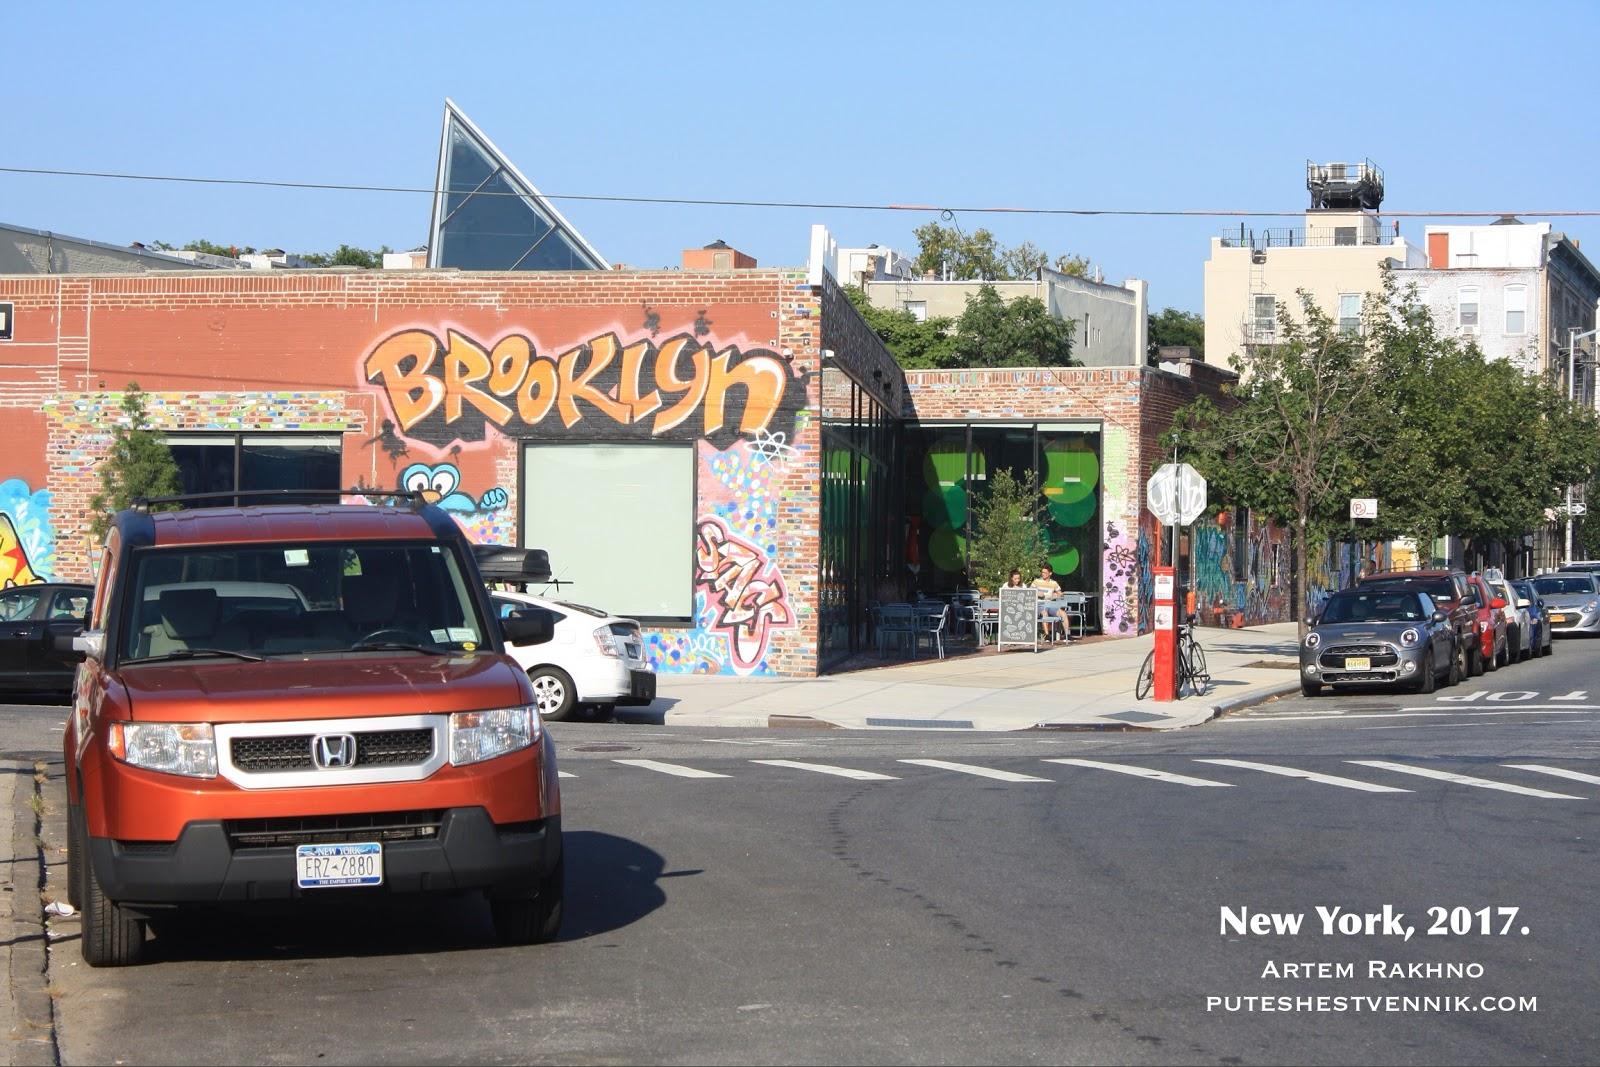 Авто и граффити в Бруклине